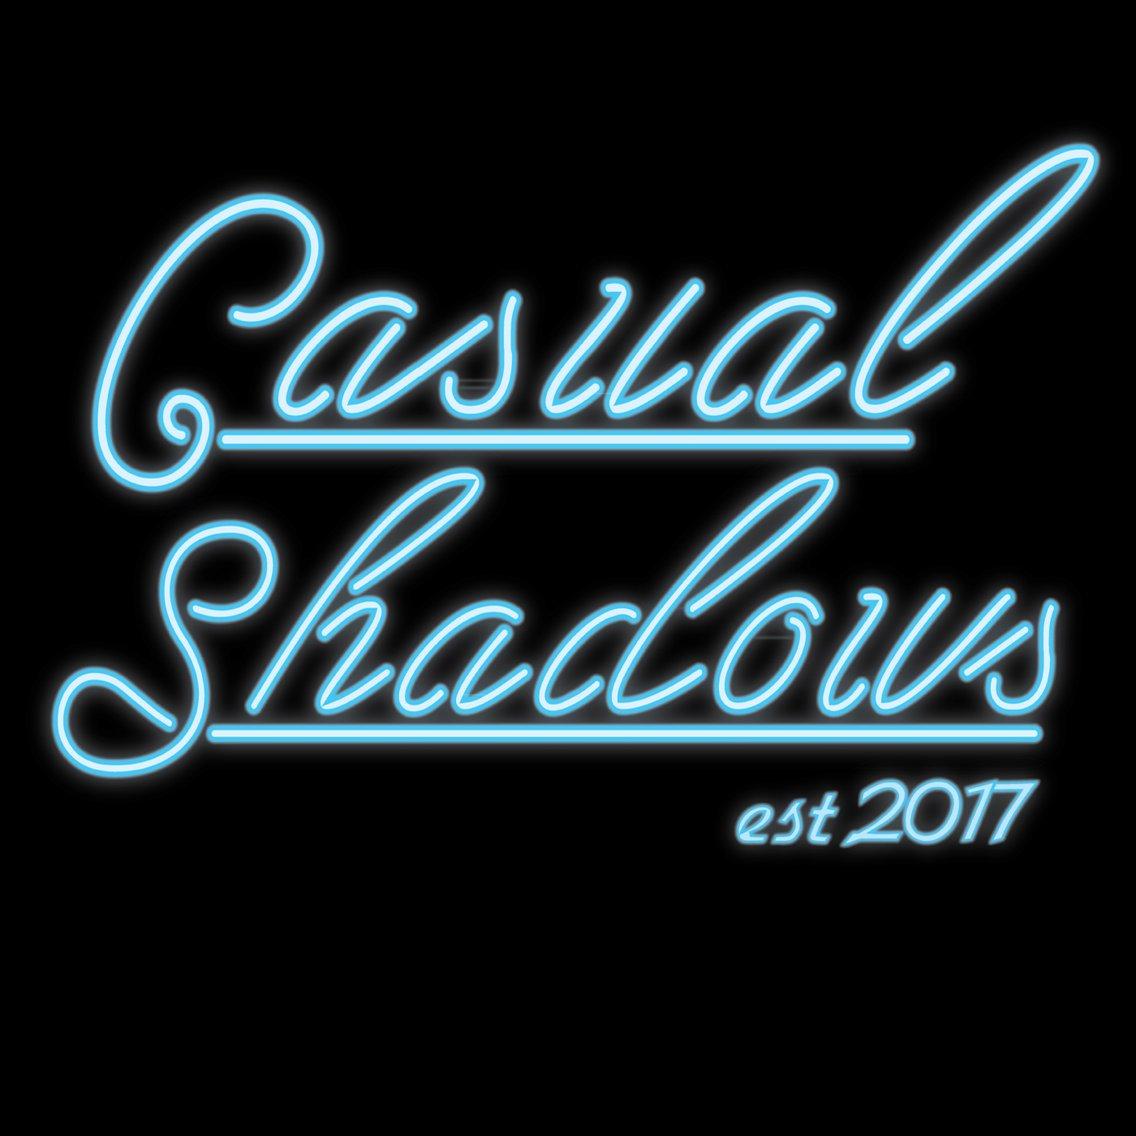 Casual Shadows - immagine di copertina